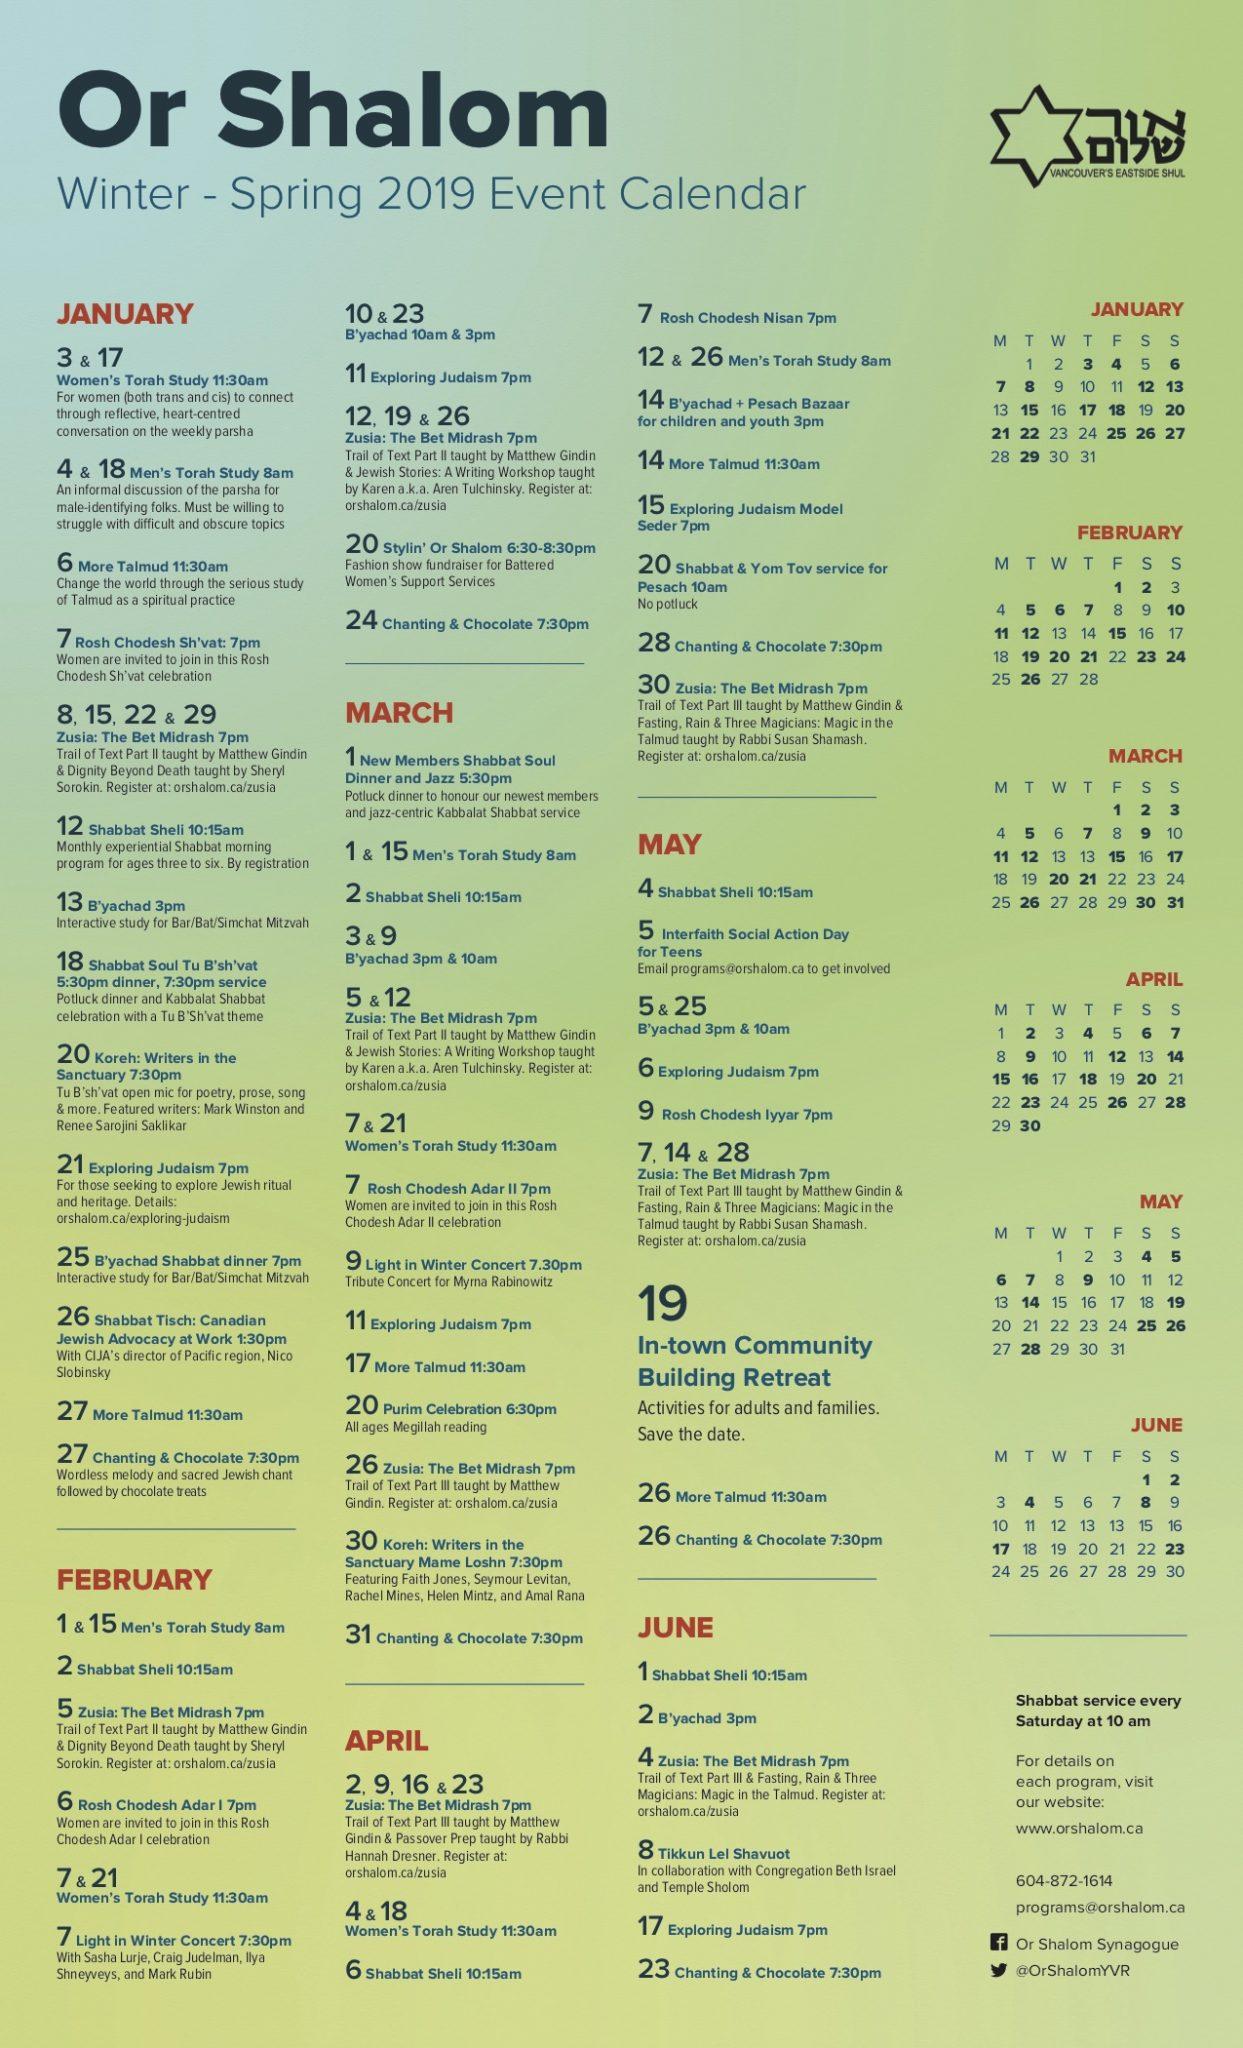 Shabbat Calendar 2019 Events Calendar | Or Shalom Synagogue – אור שלום